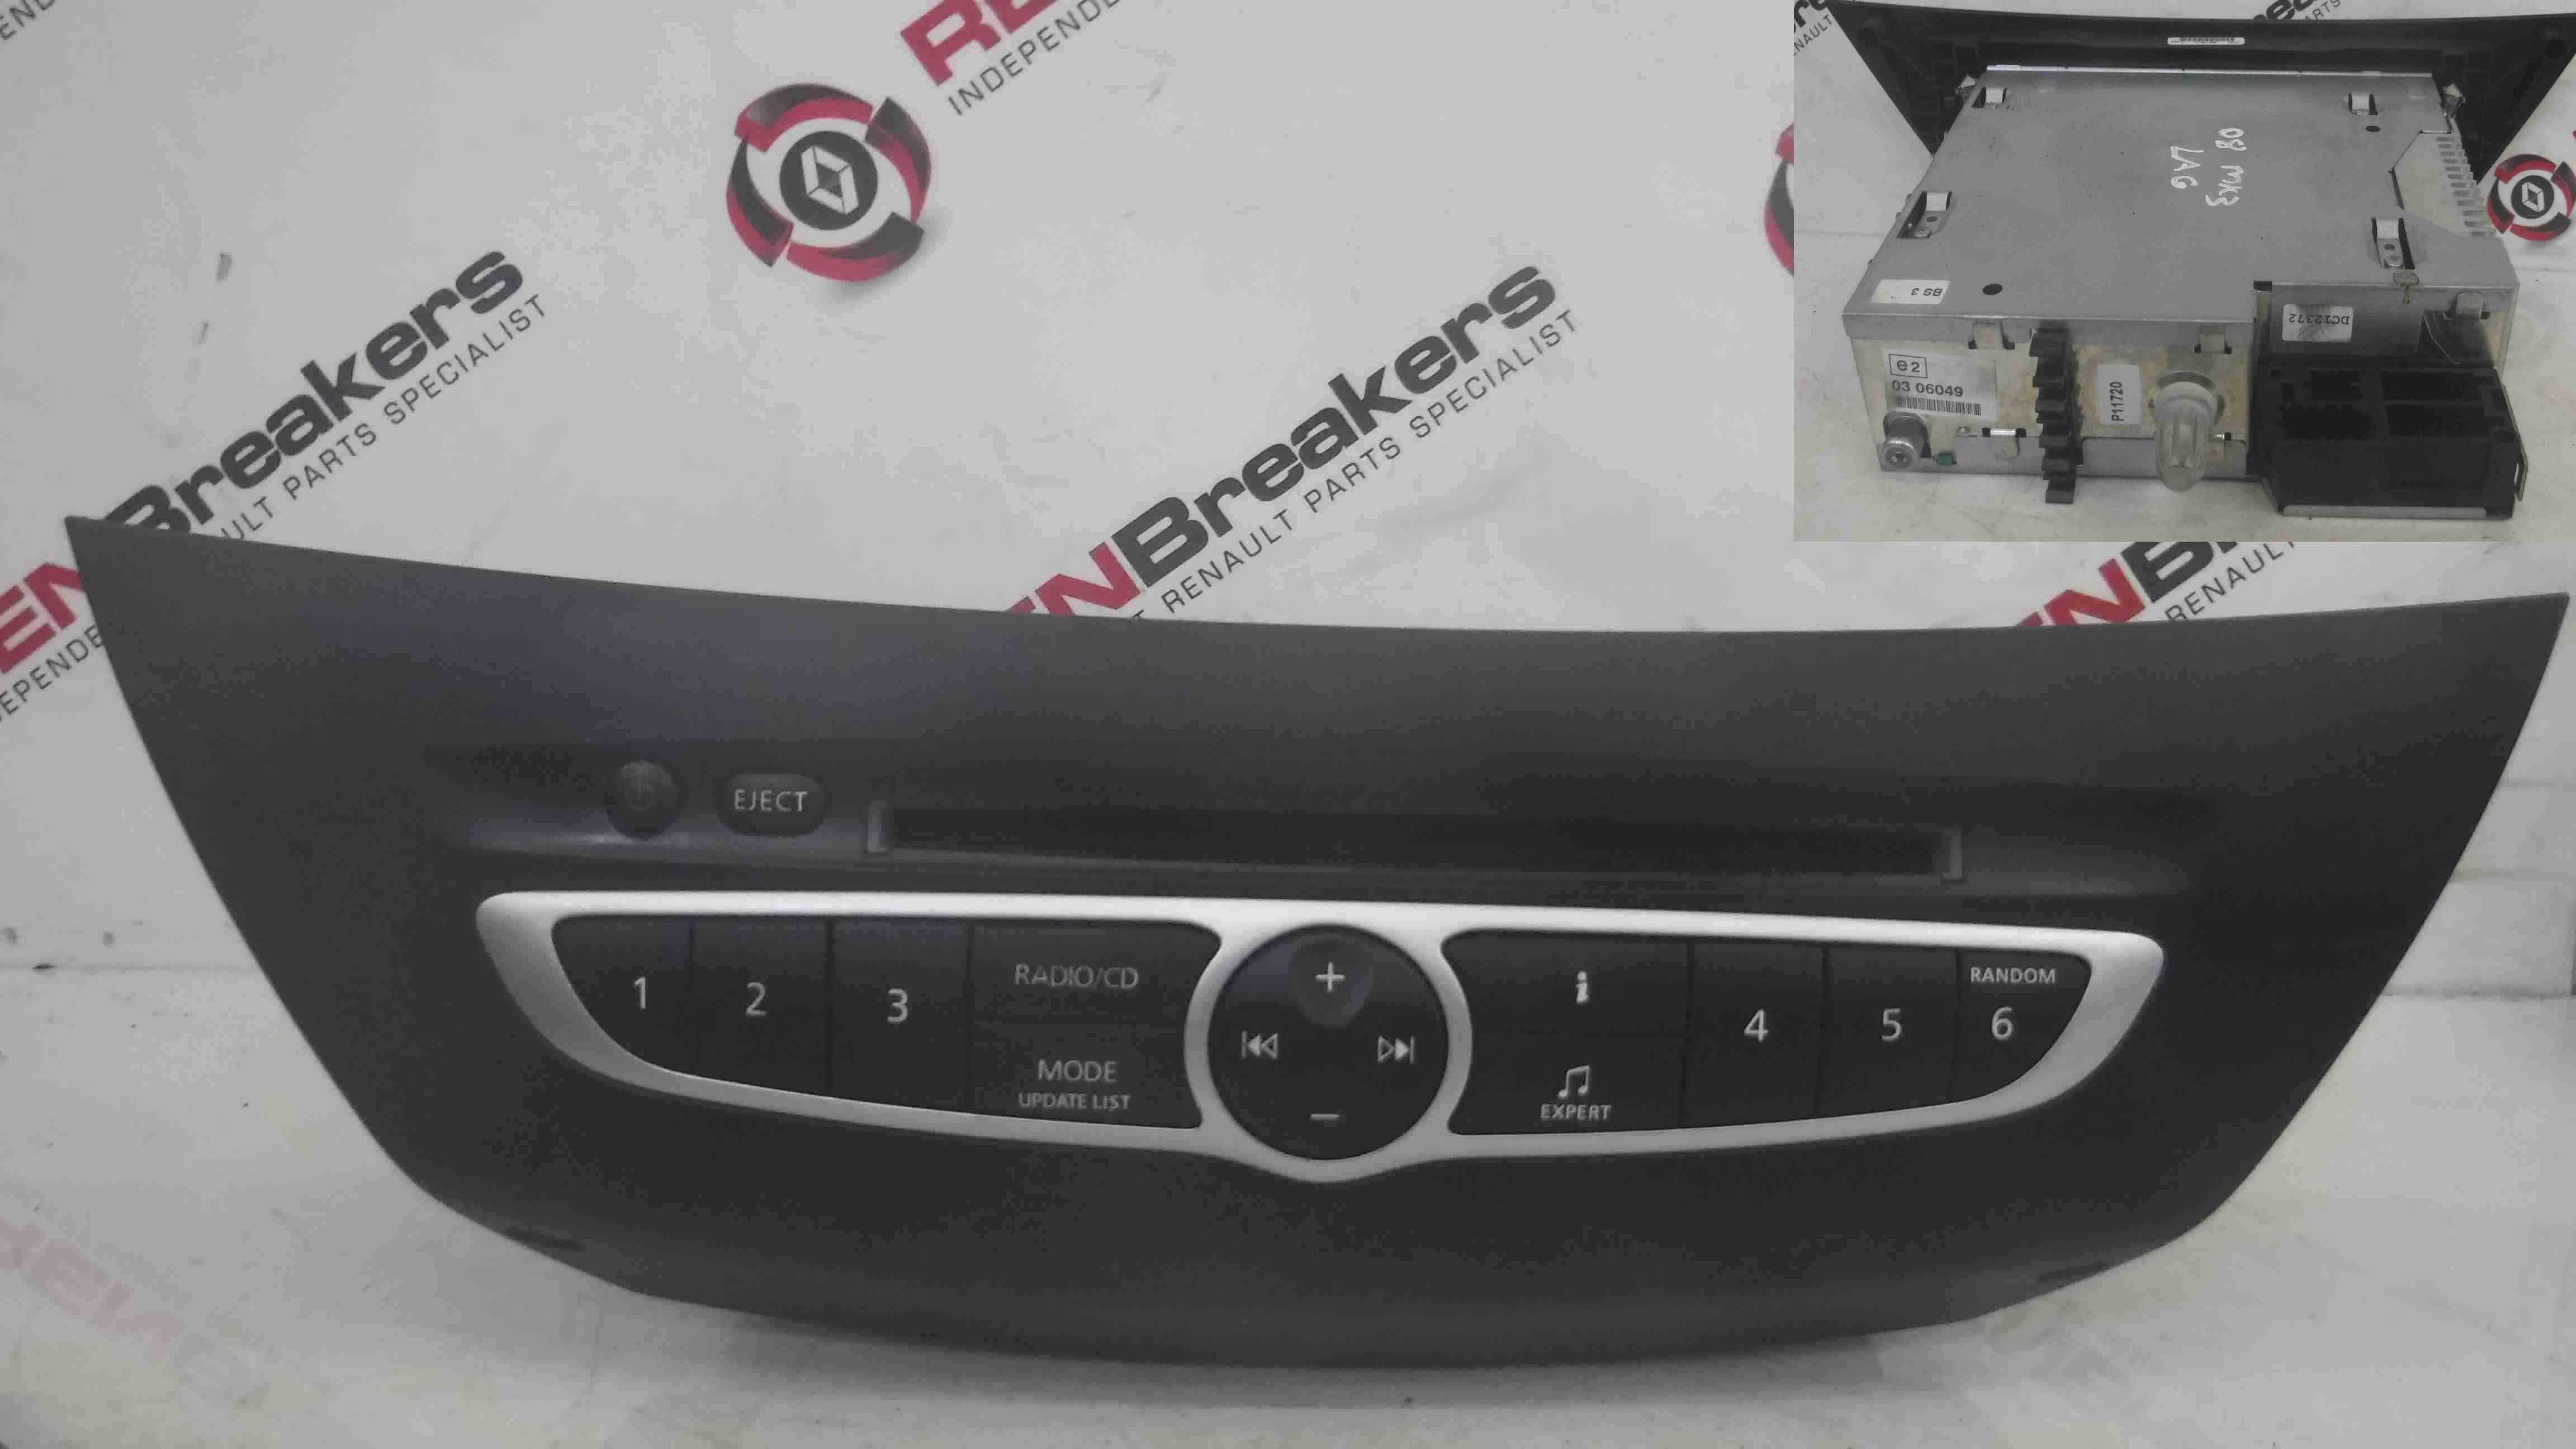 Renault Laguna MK3 2007-2012 Radio Cd Player Unit 281150013R